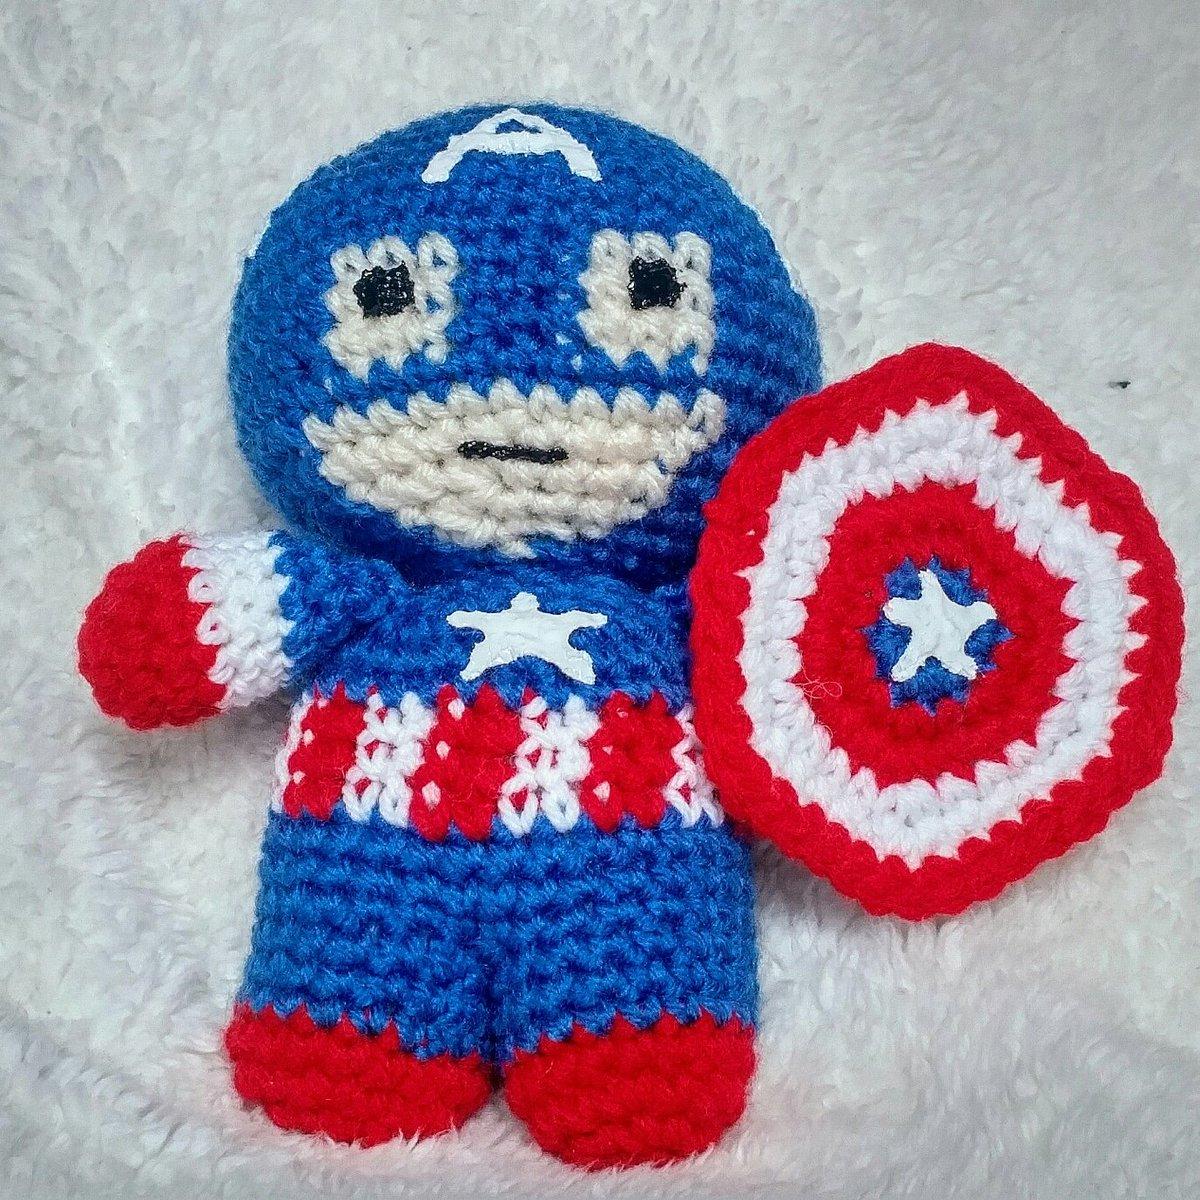 Captain America Amigurumi Crochet Doll Pattern | Amigurumi ... | 1200x1200